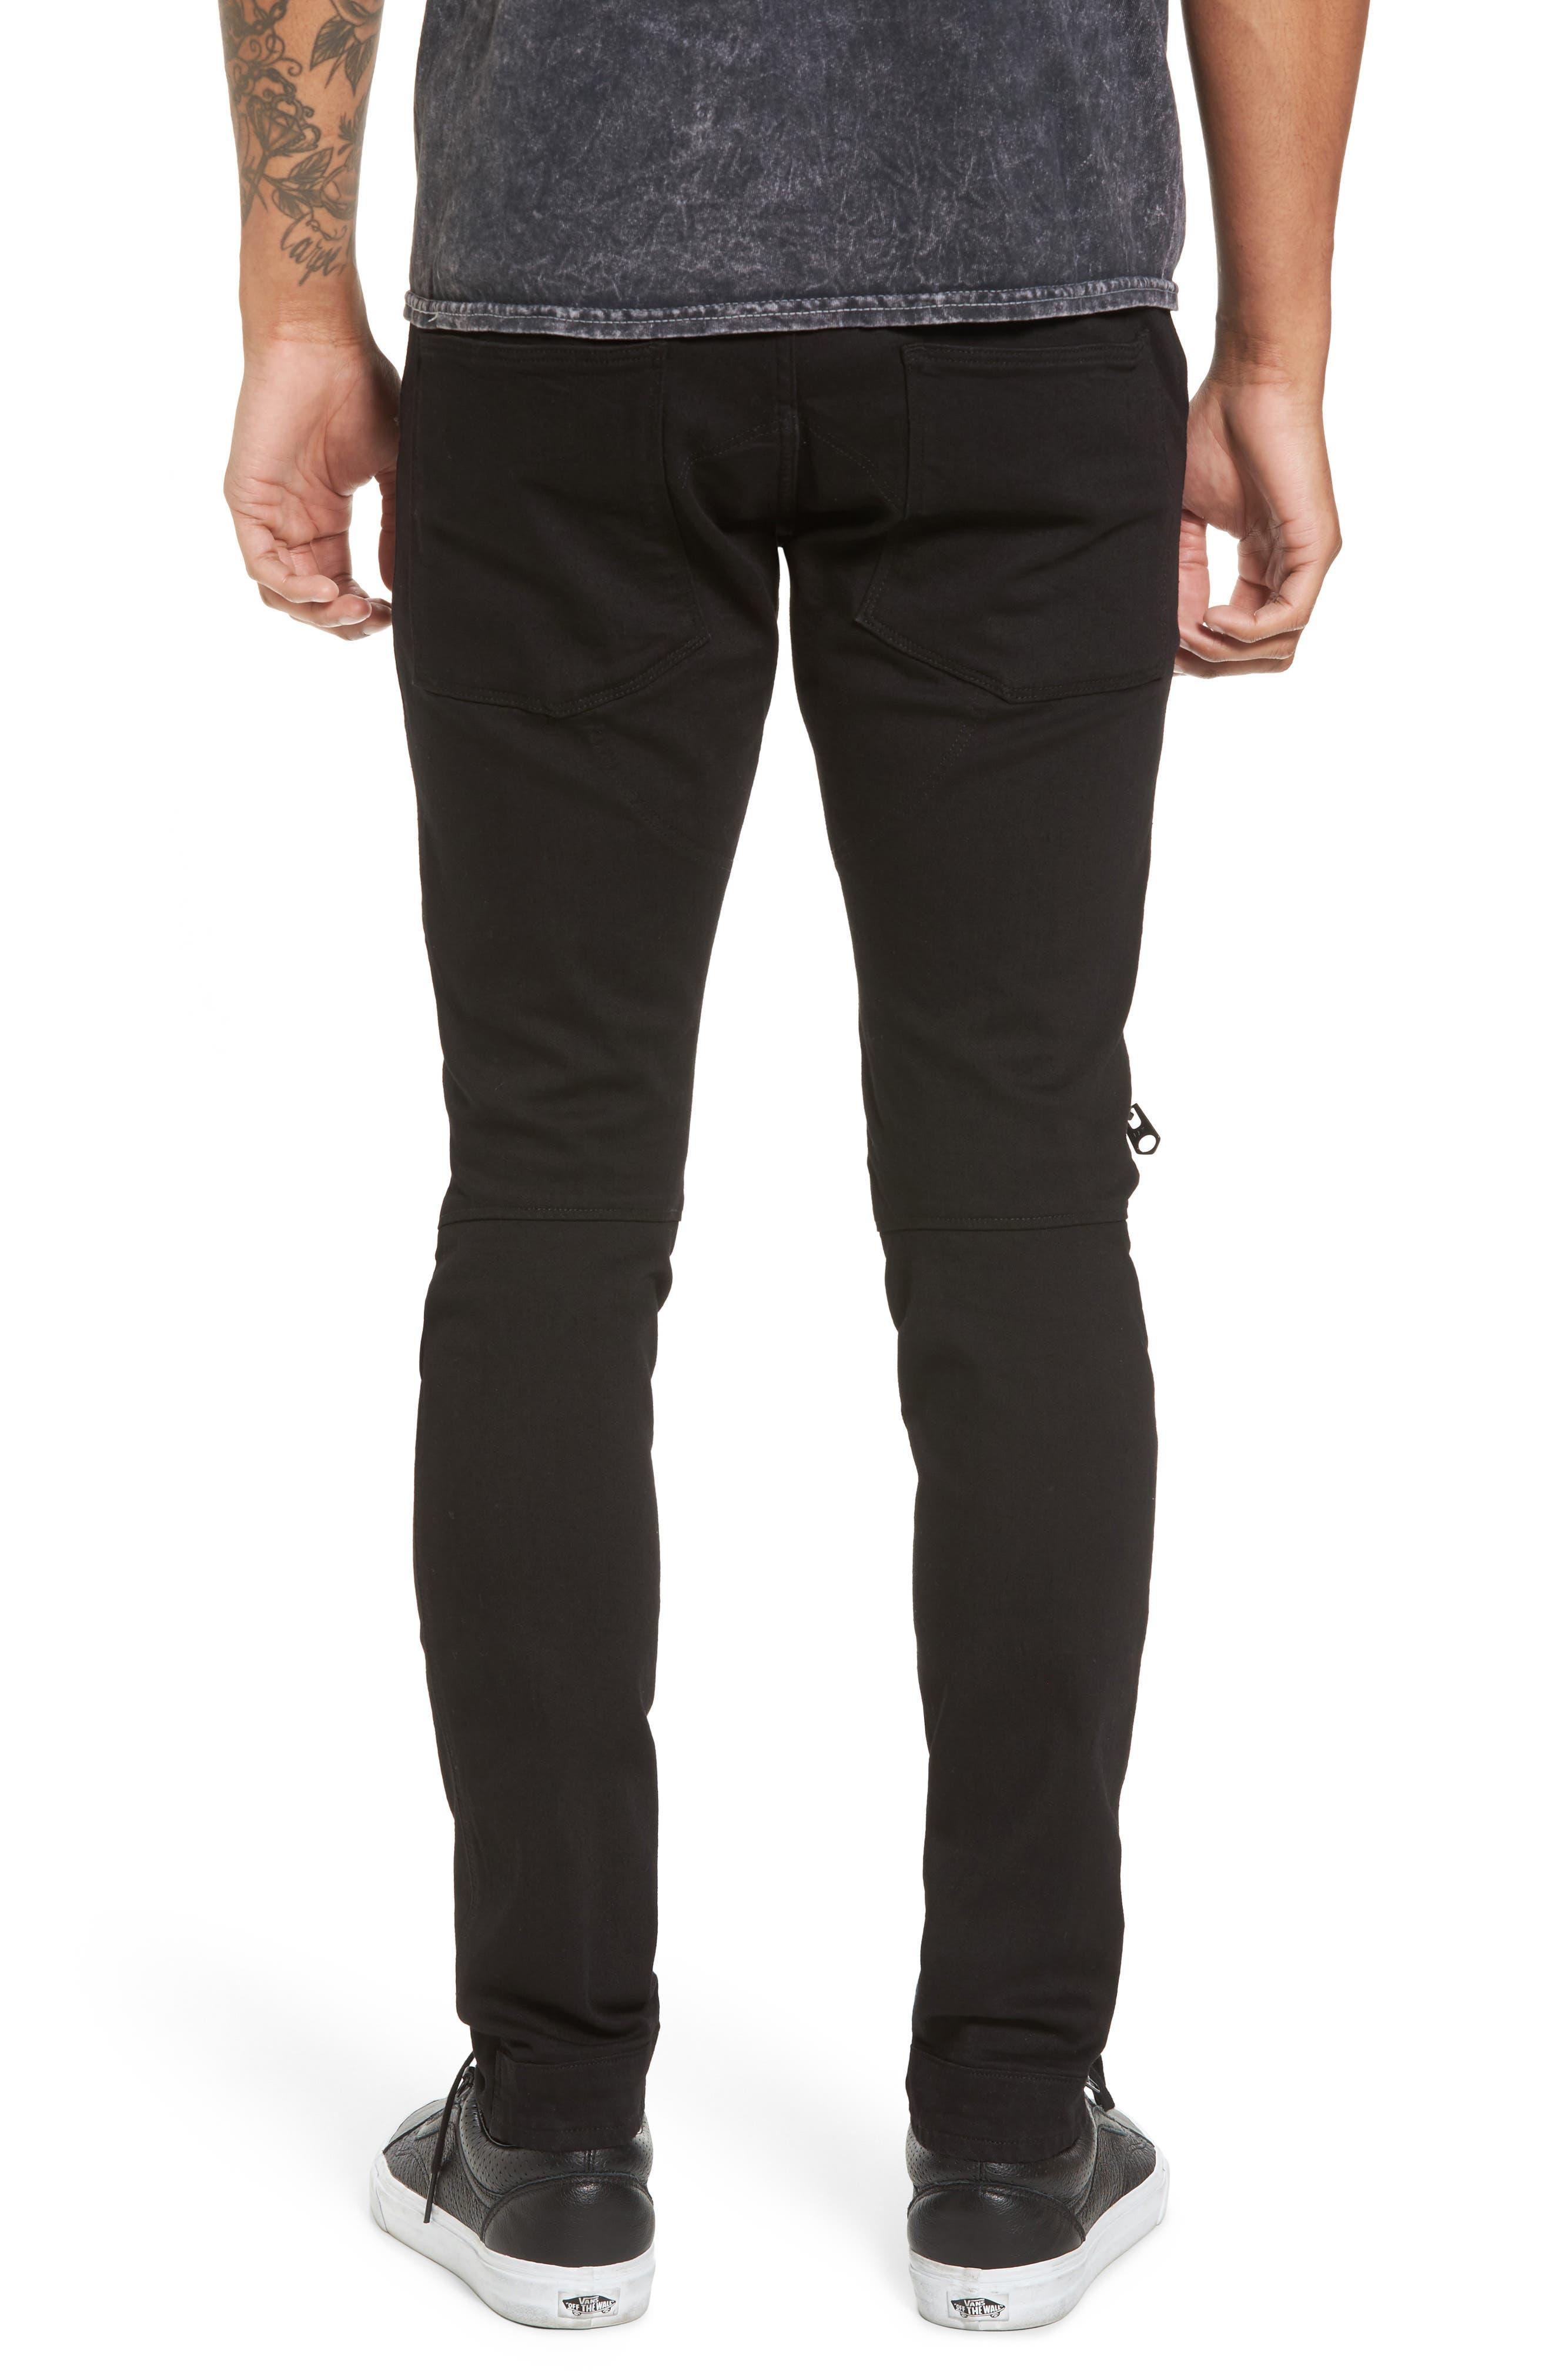 3D Zip Knee Super Slim Pants,                             Alternate thumbnail 2, color,                             001